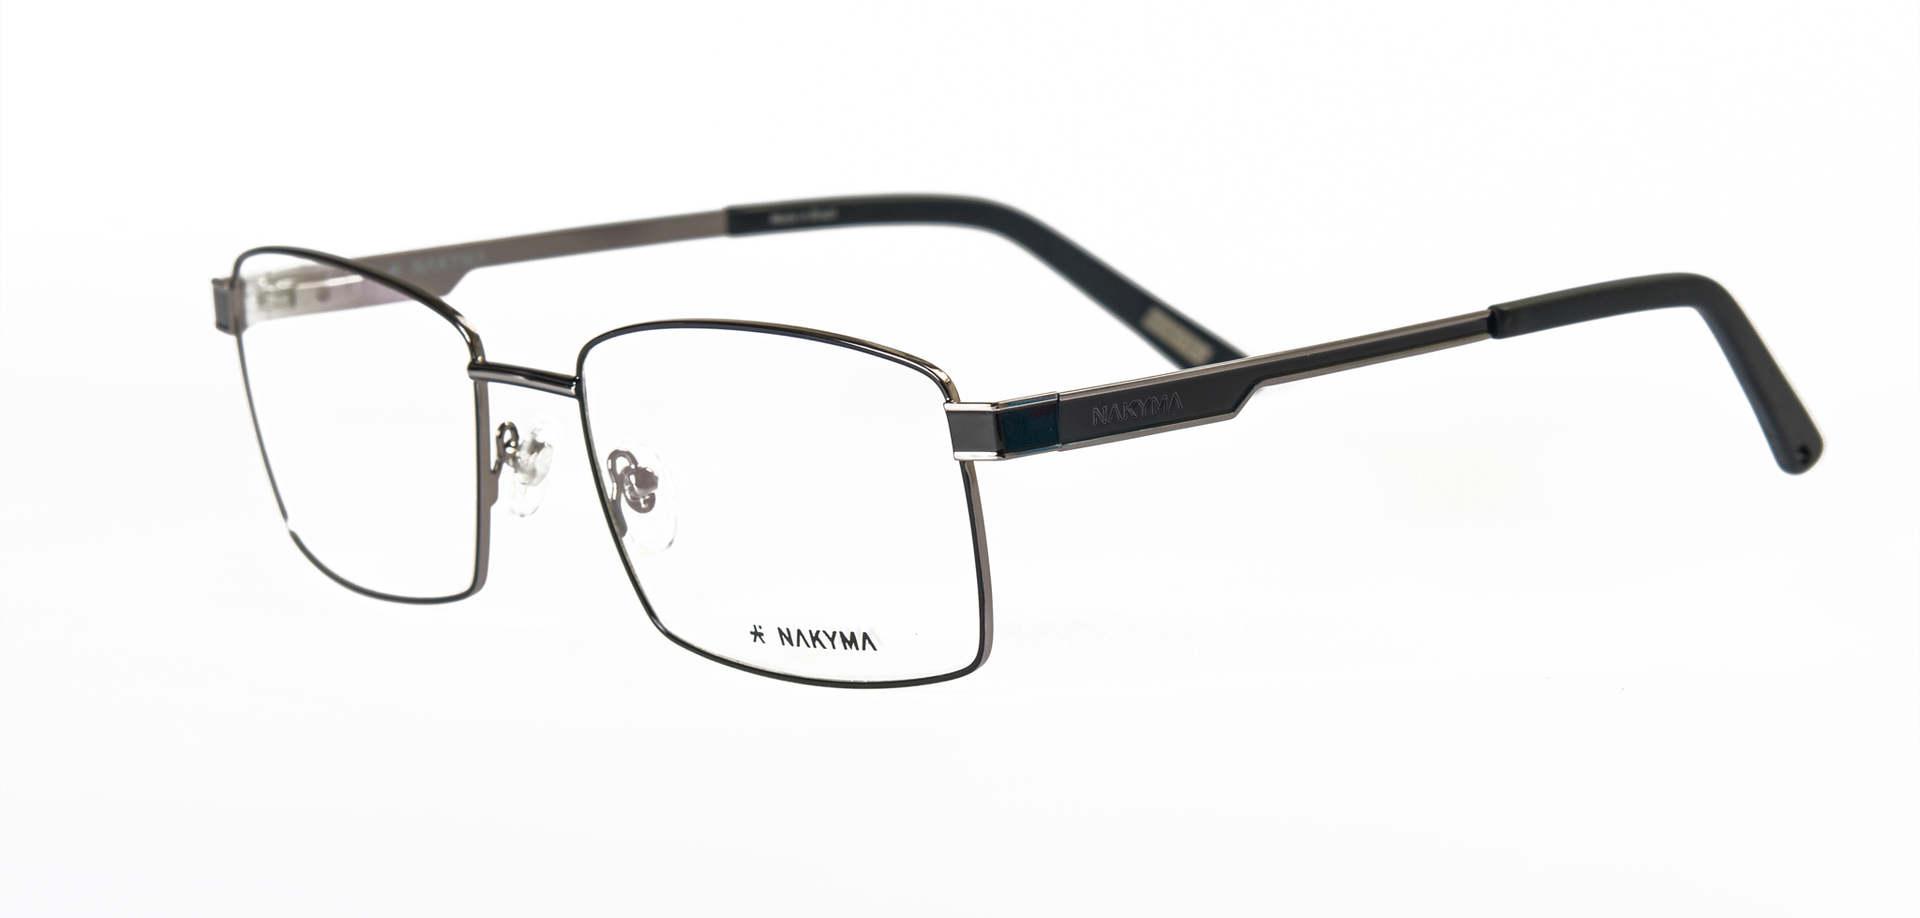 8R1-NAKYMA-05 C1